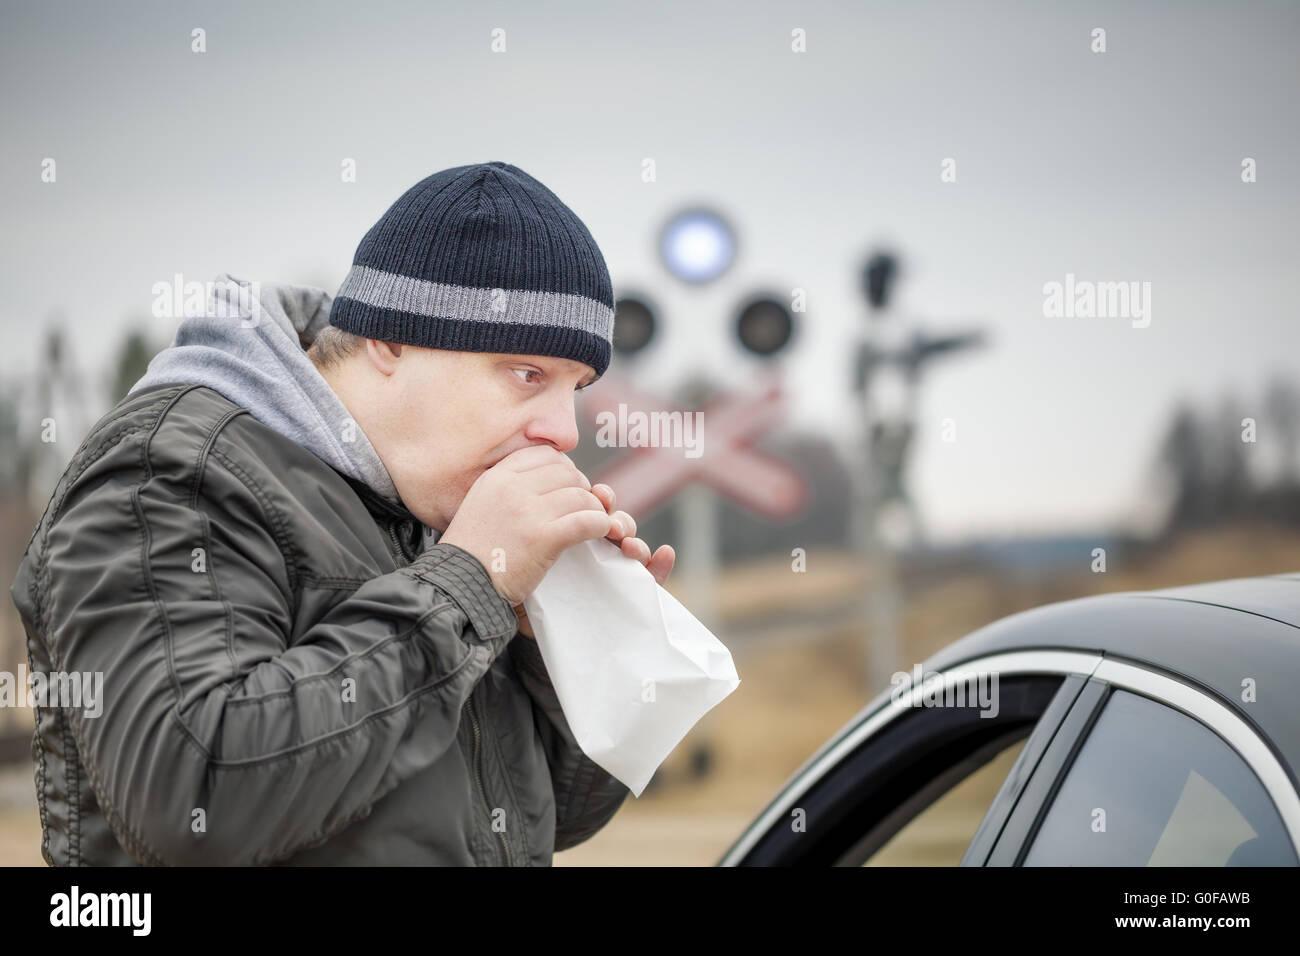 Worried man breathe into a paper bag near rail cro - Stock Image